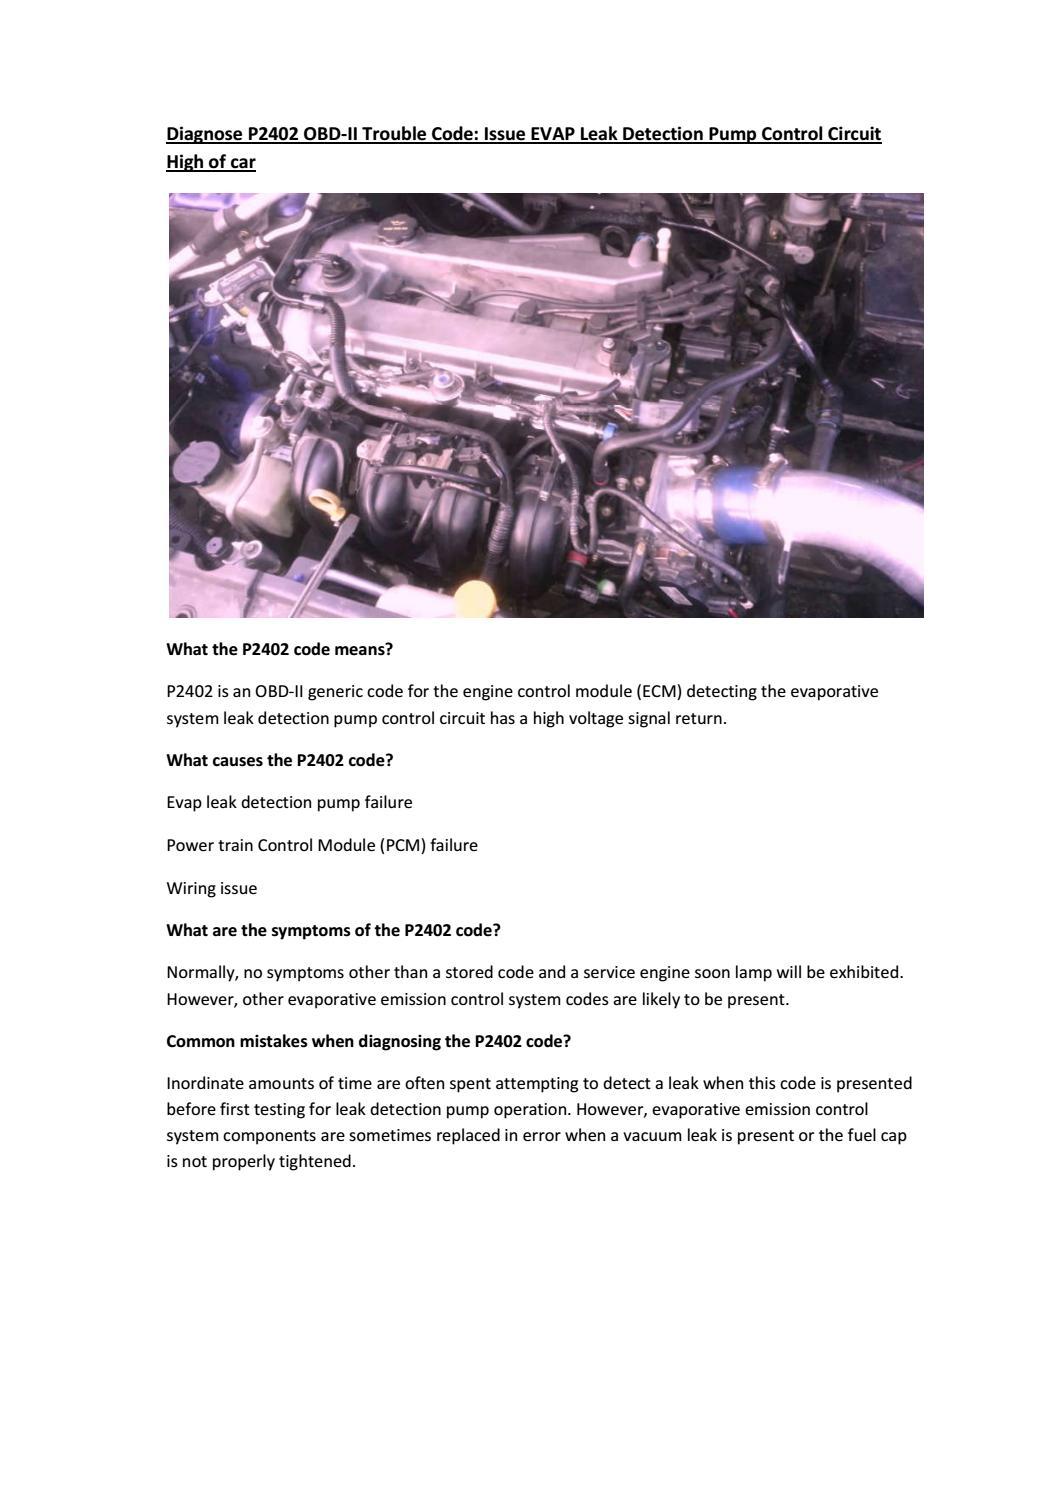 Partsavatar CA - Diagnose P2402 OBD-II Trouble Code by